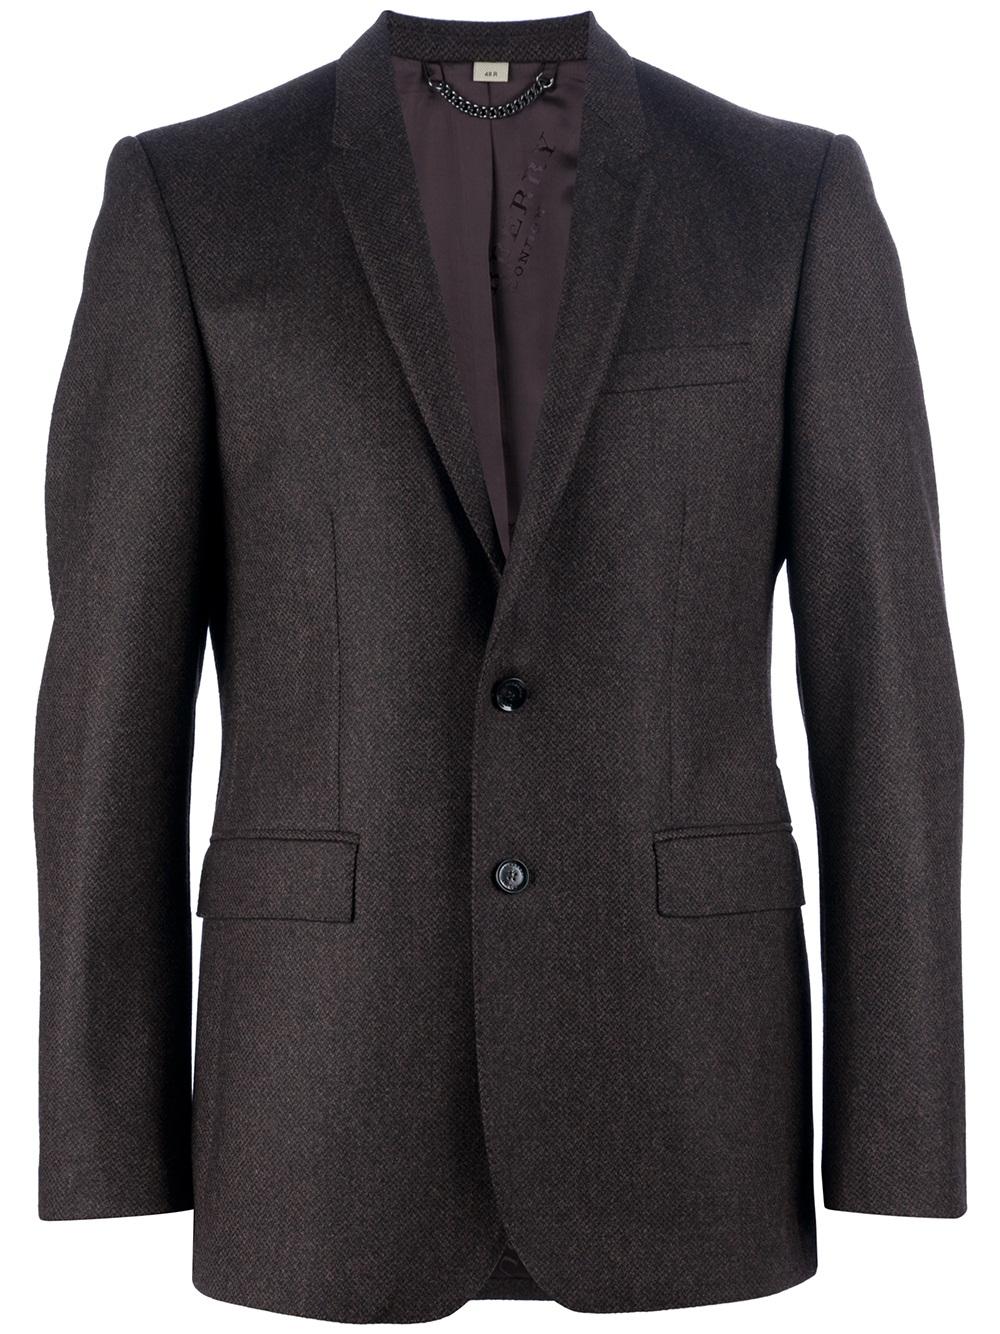 Lyst Burberry Tweed Jacket In Brown For Men